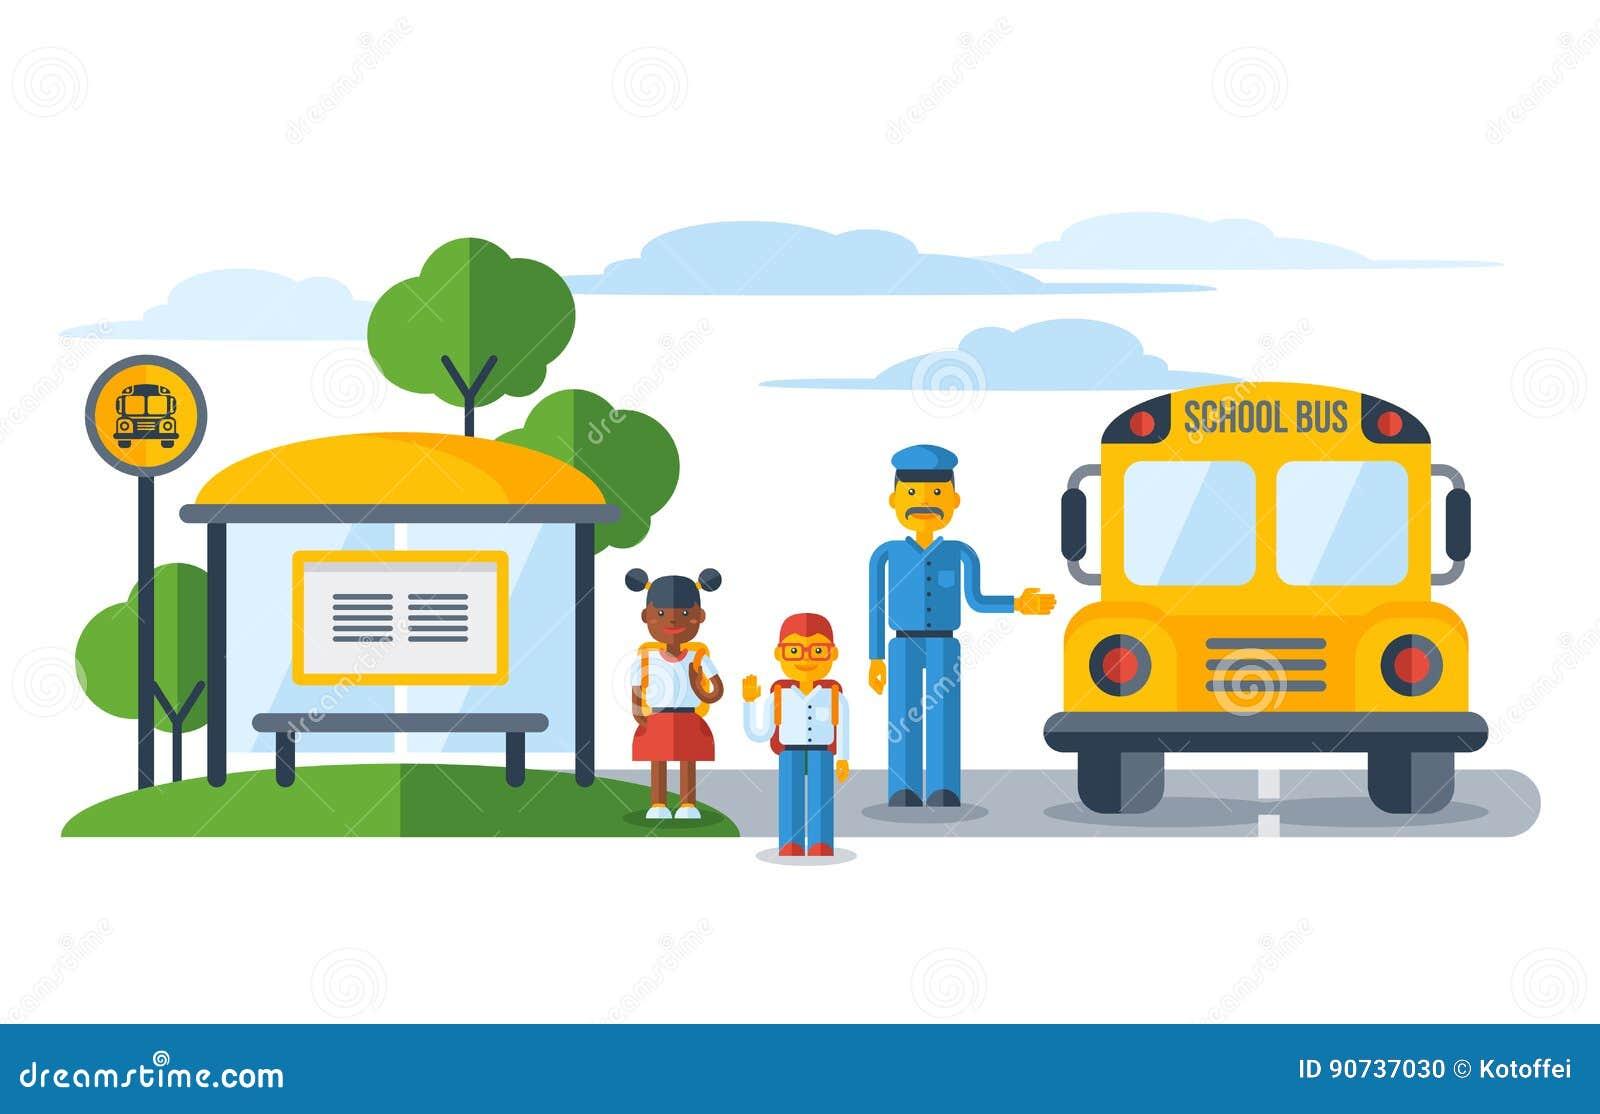 Schoolers Getting On Yellow Schoolbus At Bus Stop Stock ...